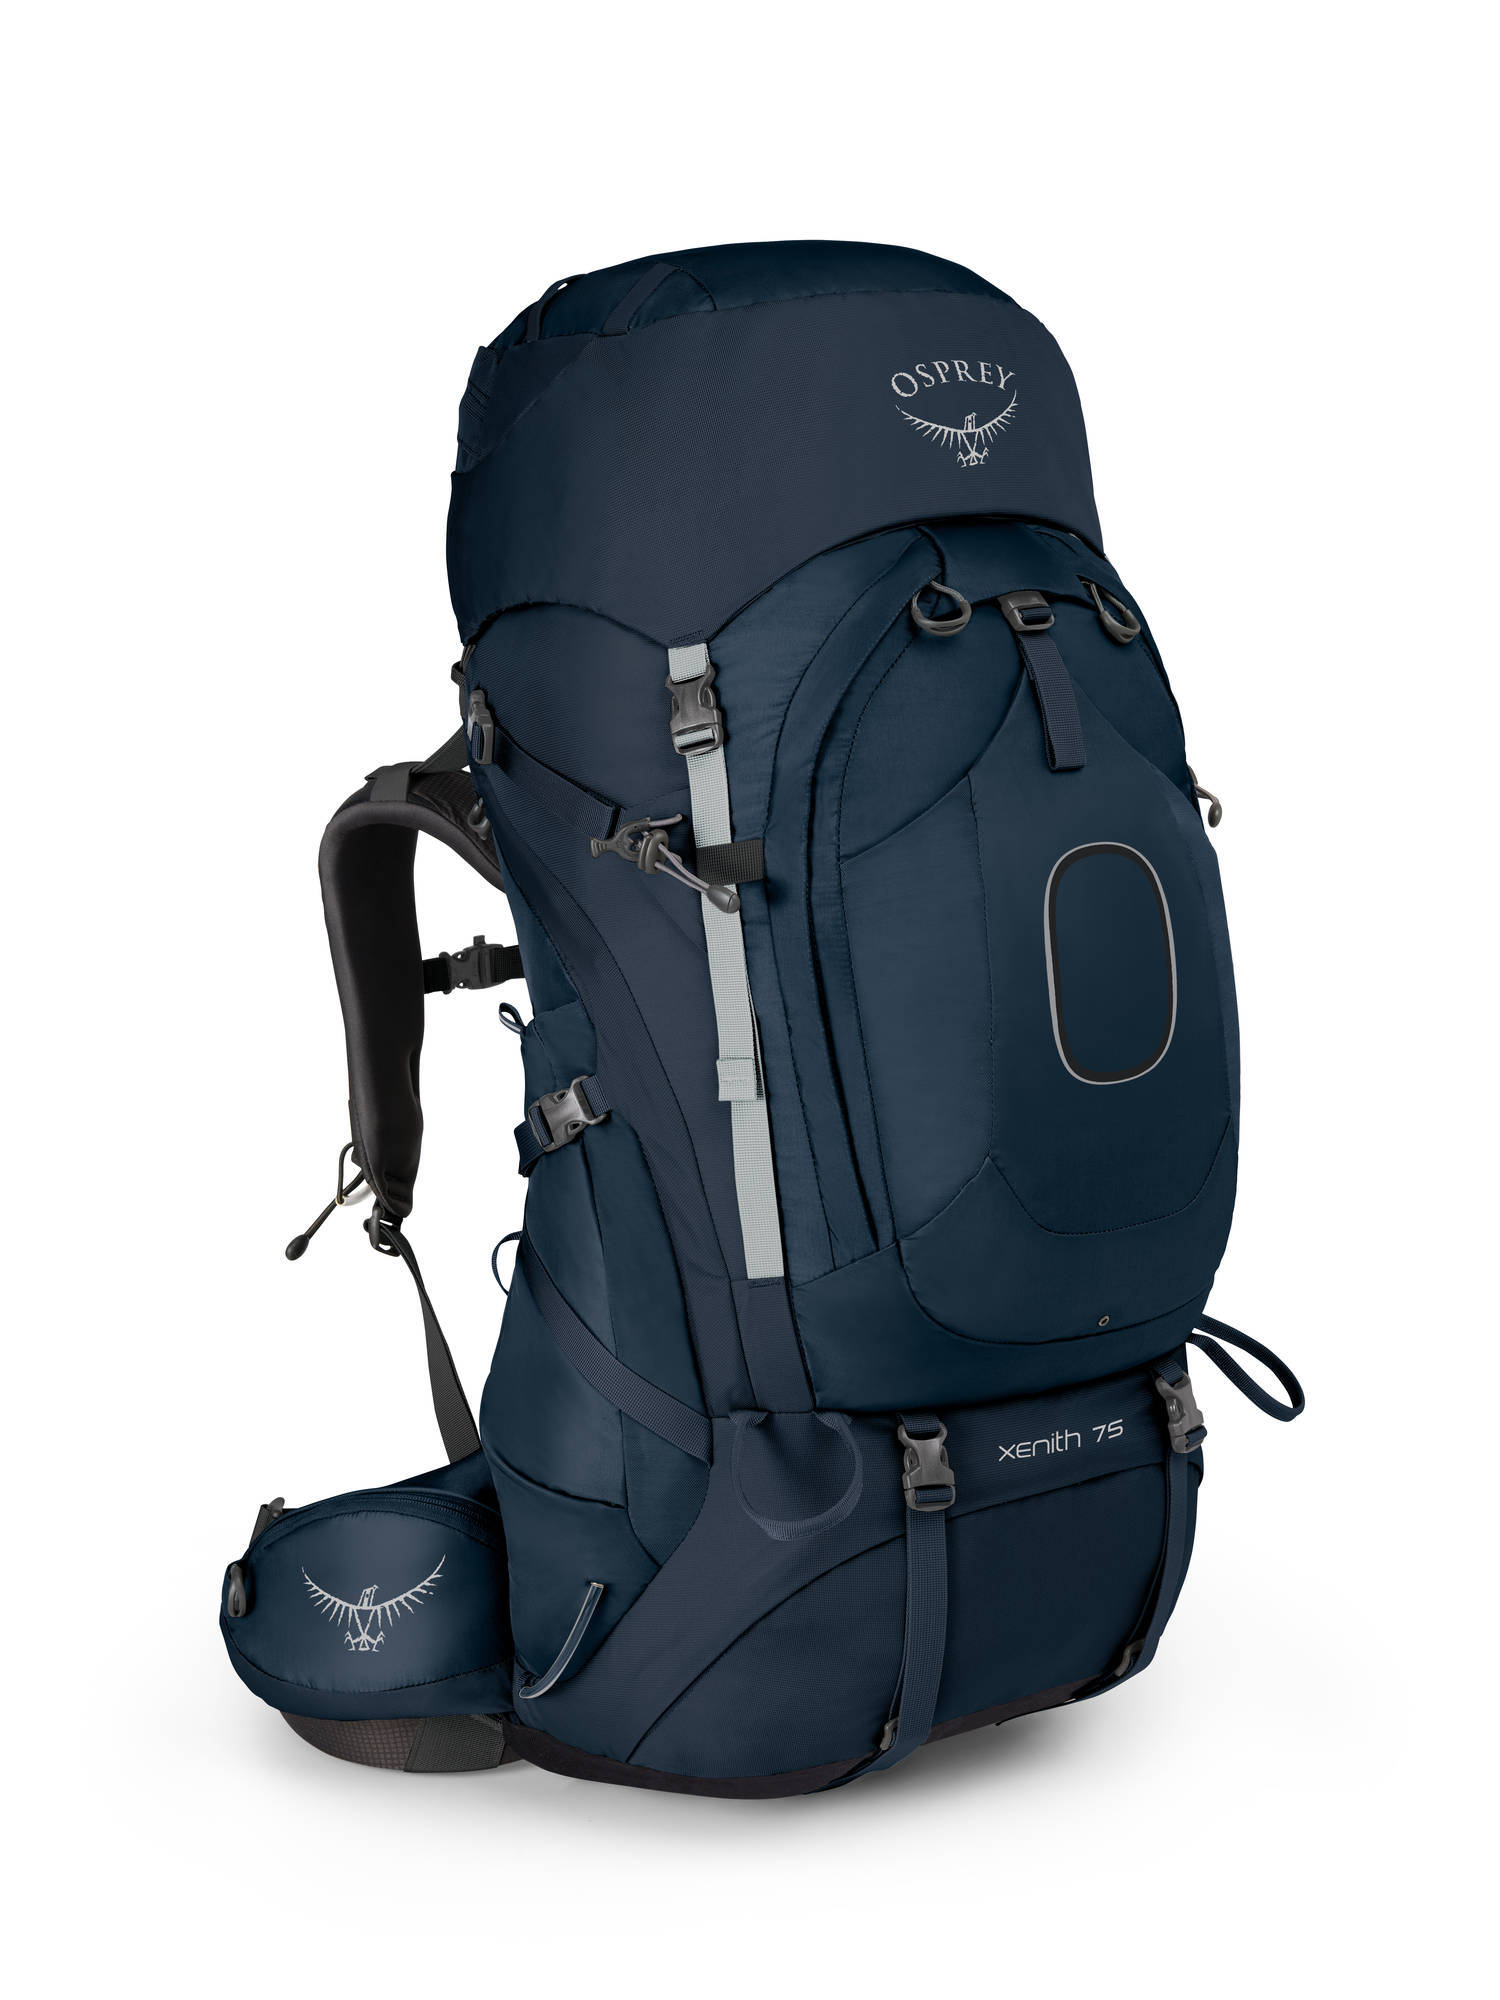 Рюкзак Xenith 75 M Discovery Blue, 1033854.132, Экспедиционные рюкзаки - арт. 1032860270